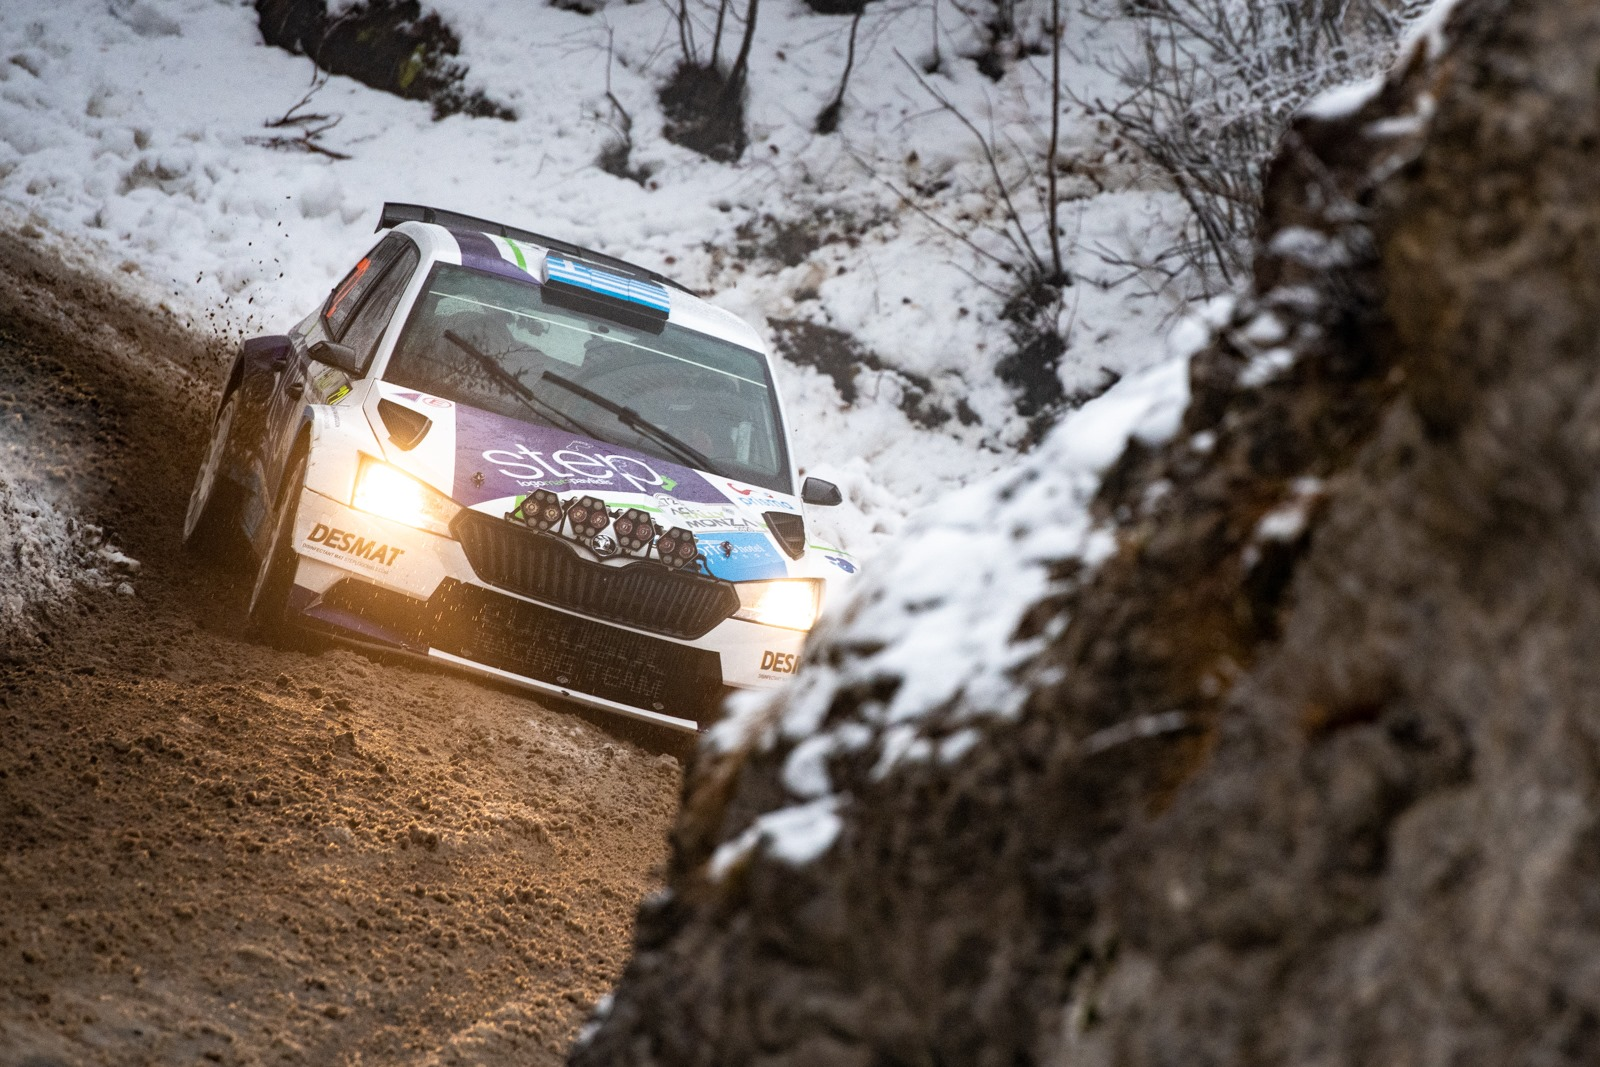 Step Racing- ACI Rally Monza- leg 2- Από την απογοήτευση στον ενθουσιασμό!